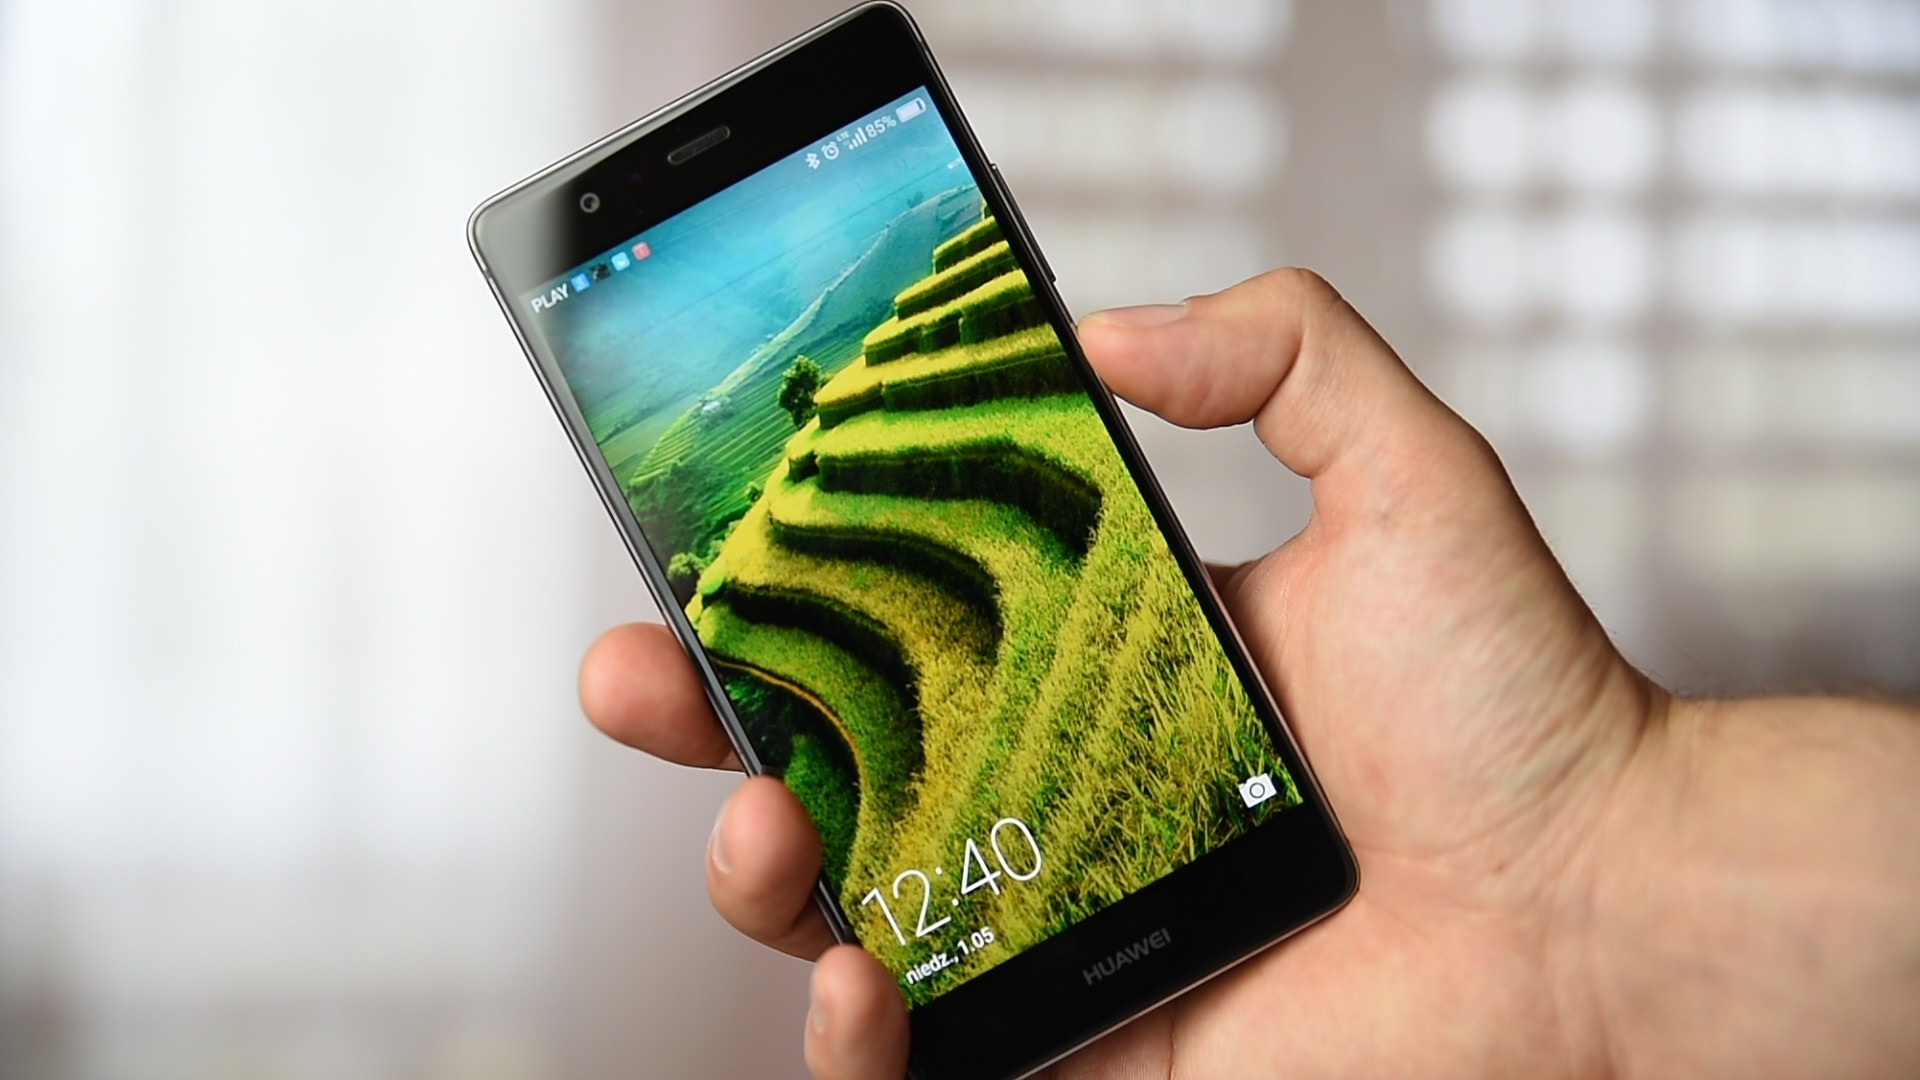 Huawei-p9-recenzja-13